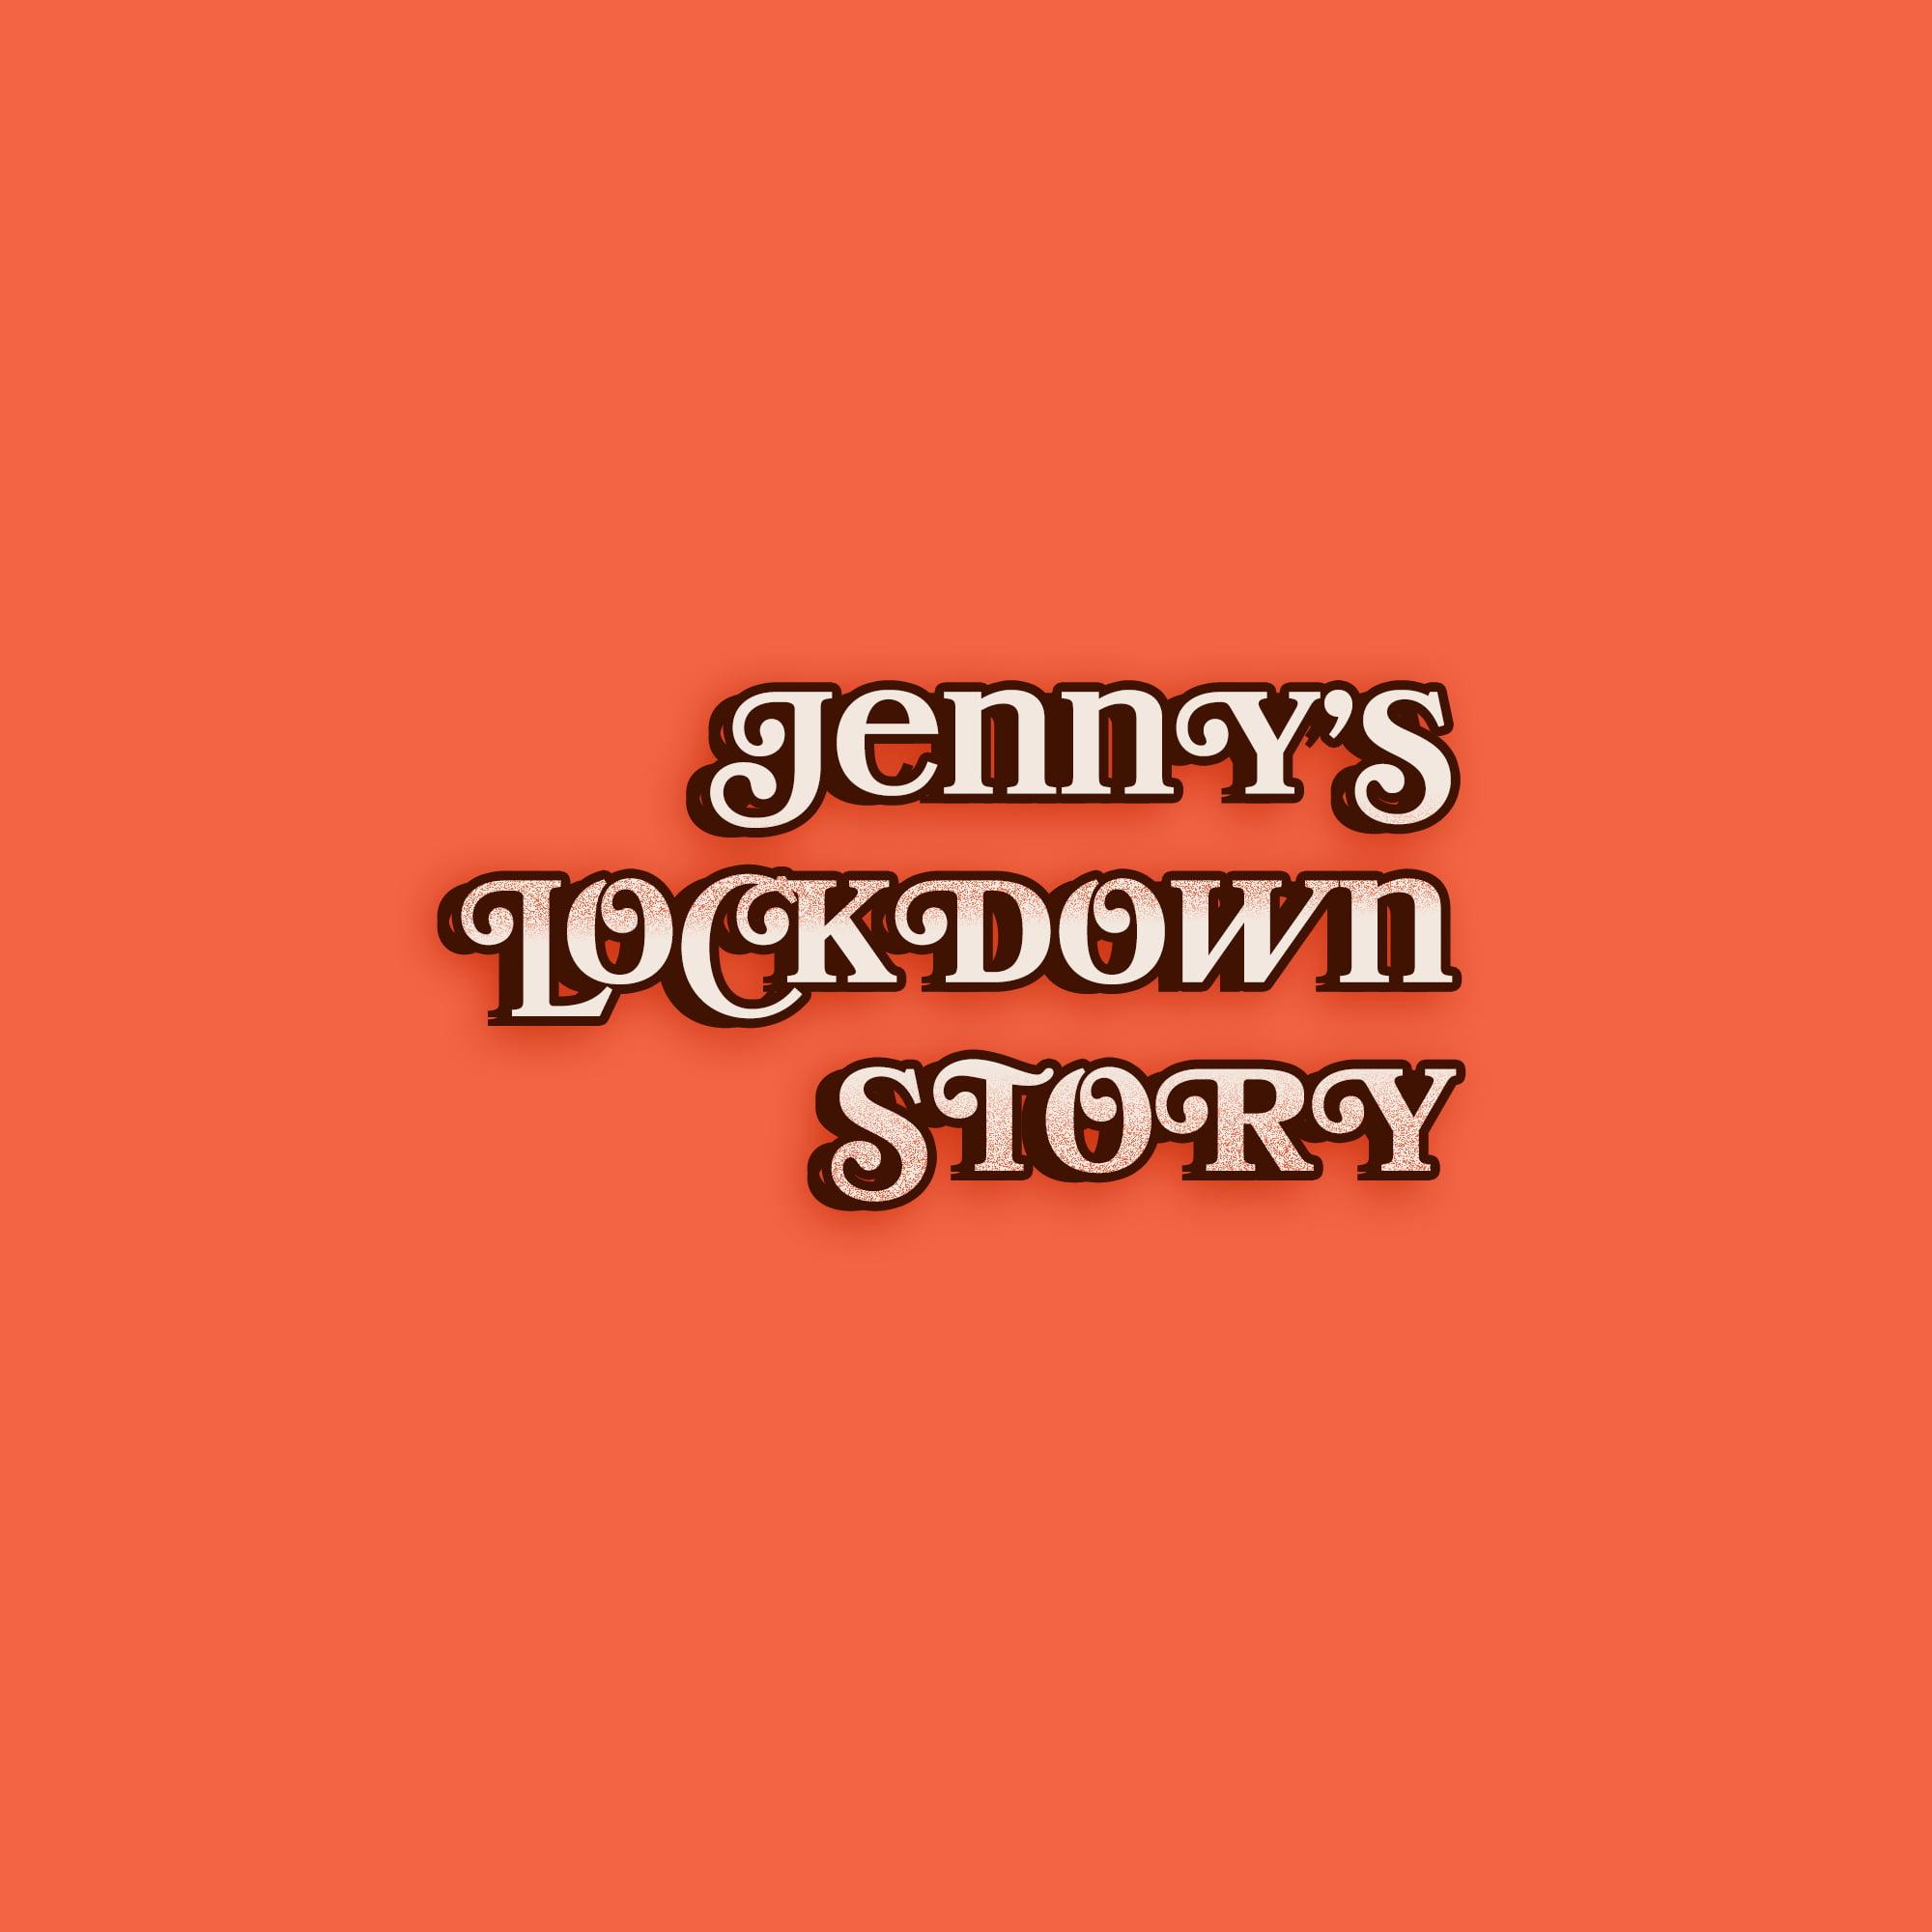 JENNY'S LOCKDOWN STORY